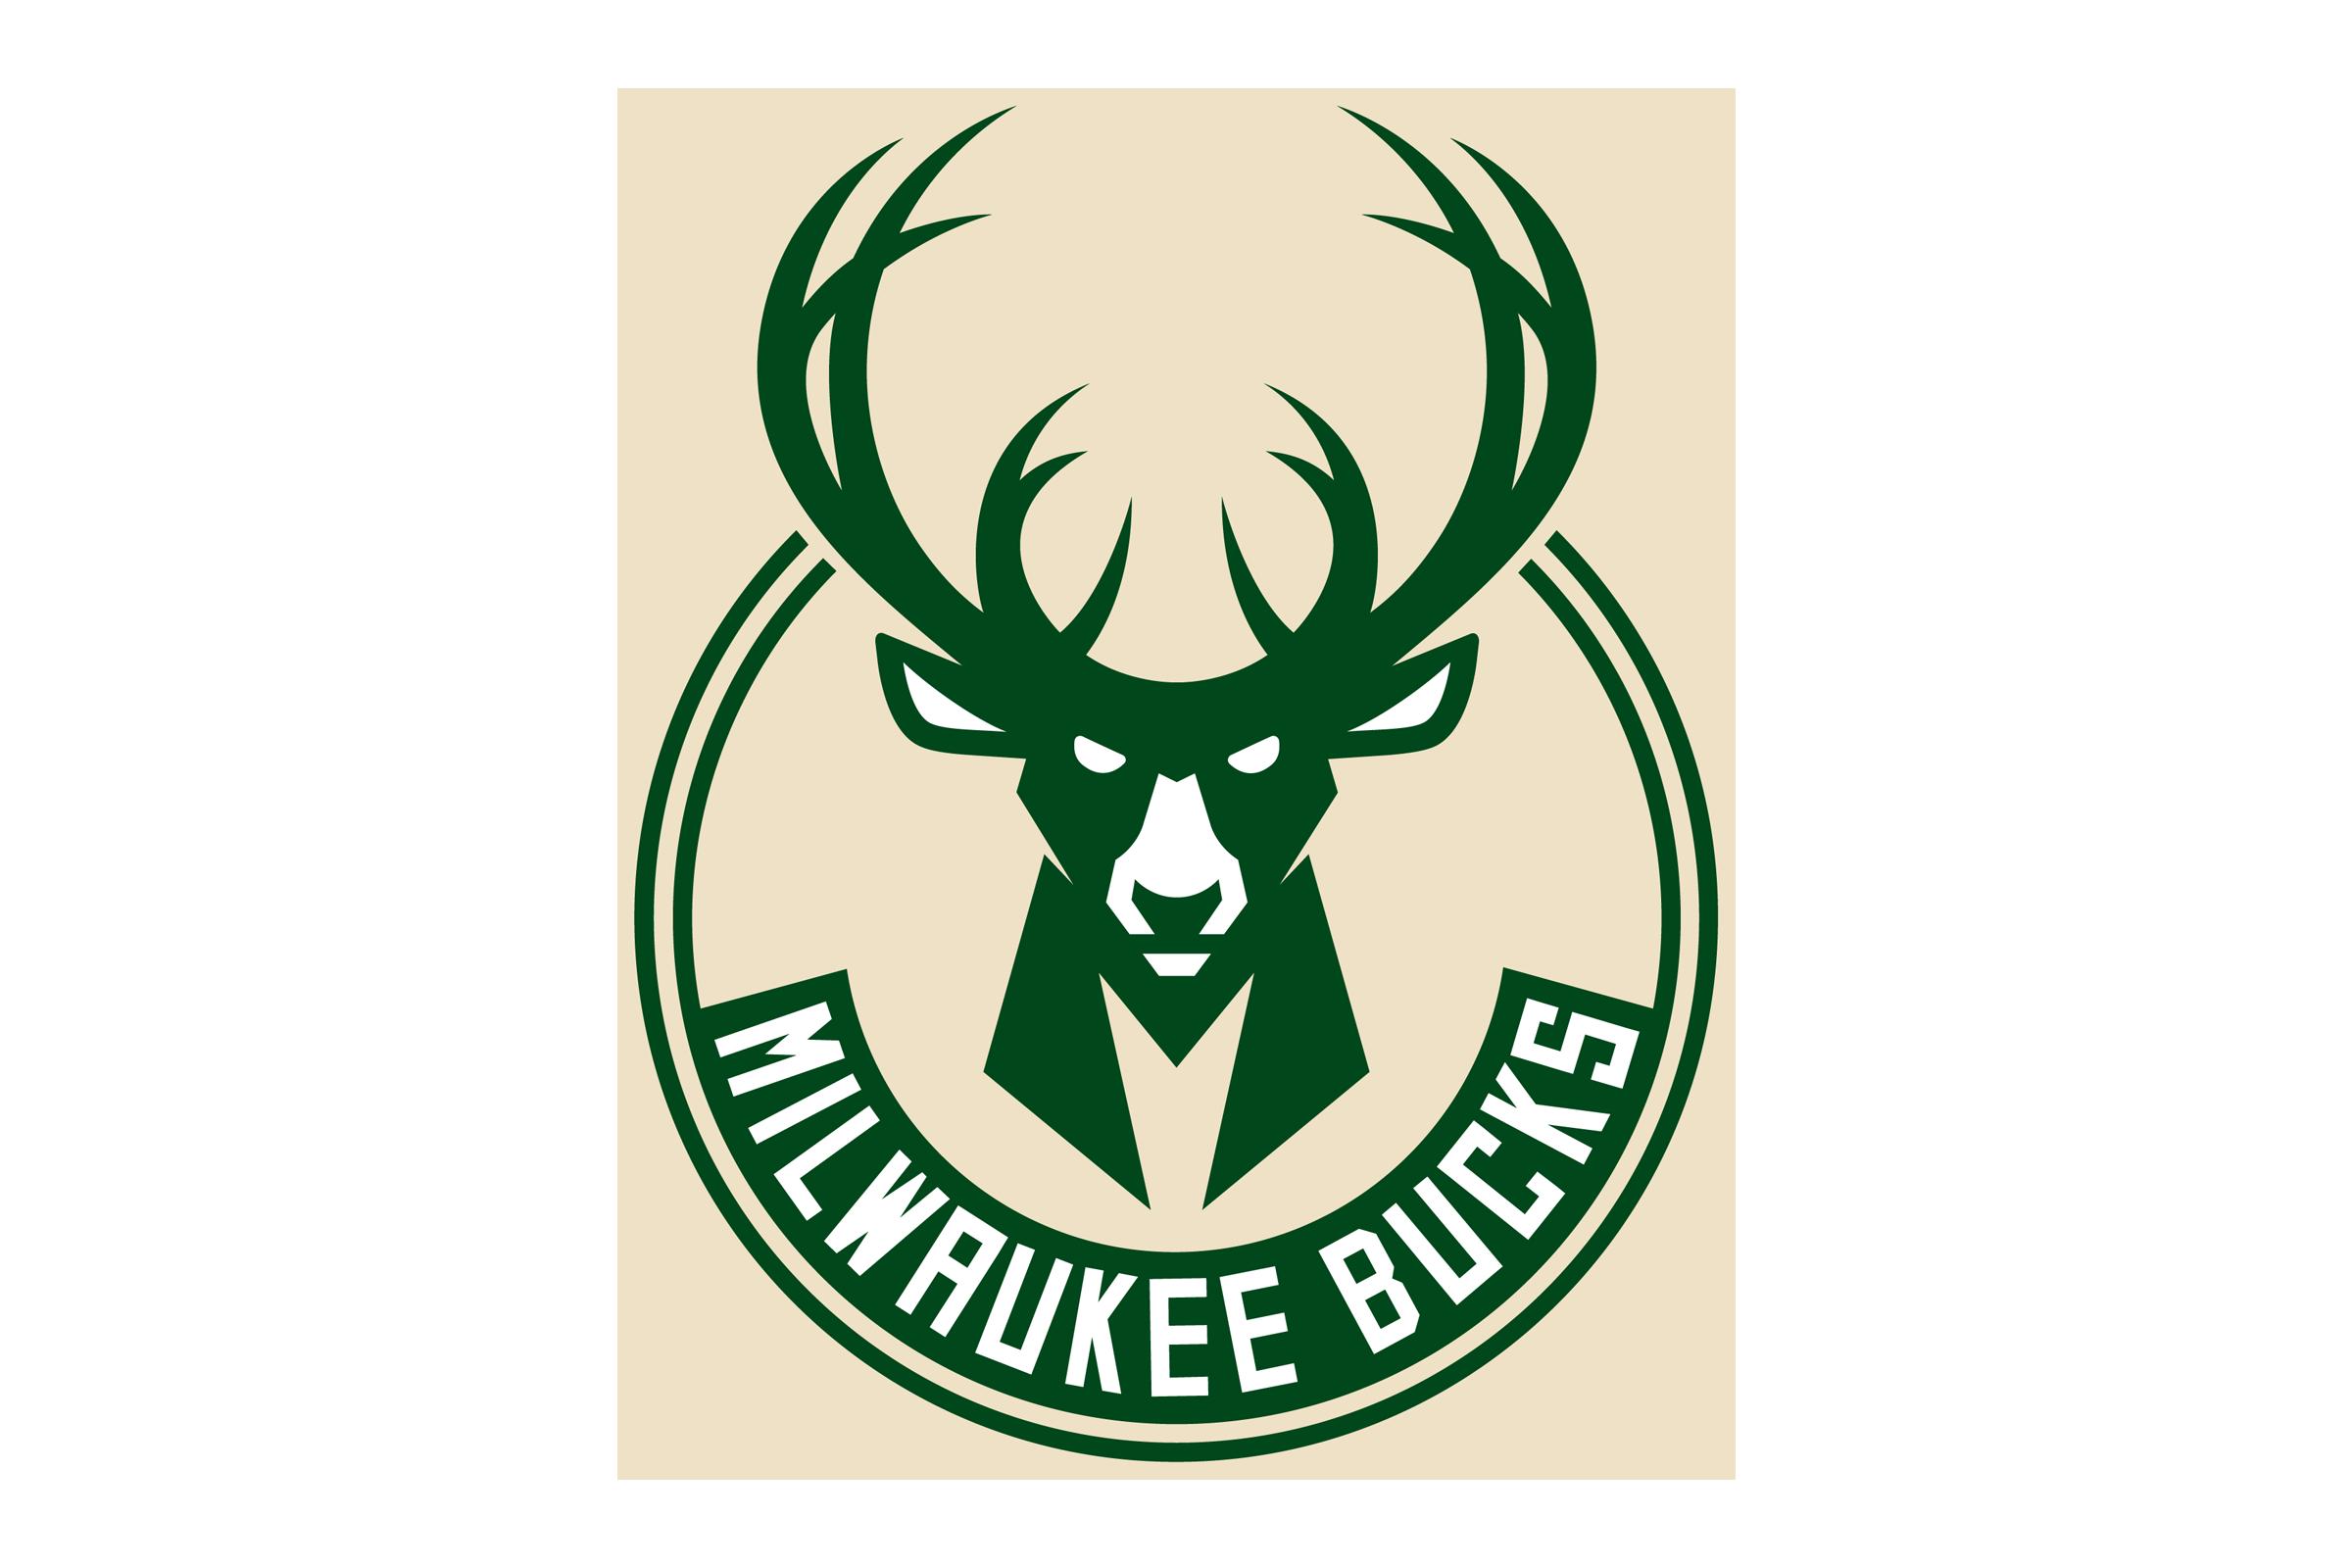 Milwaukee Bucks - 13.65% growth rate - twitter(vs. 4.28% via league average)